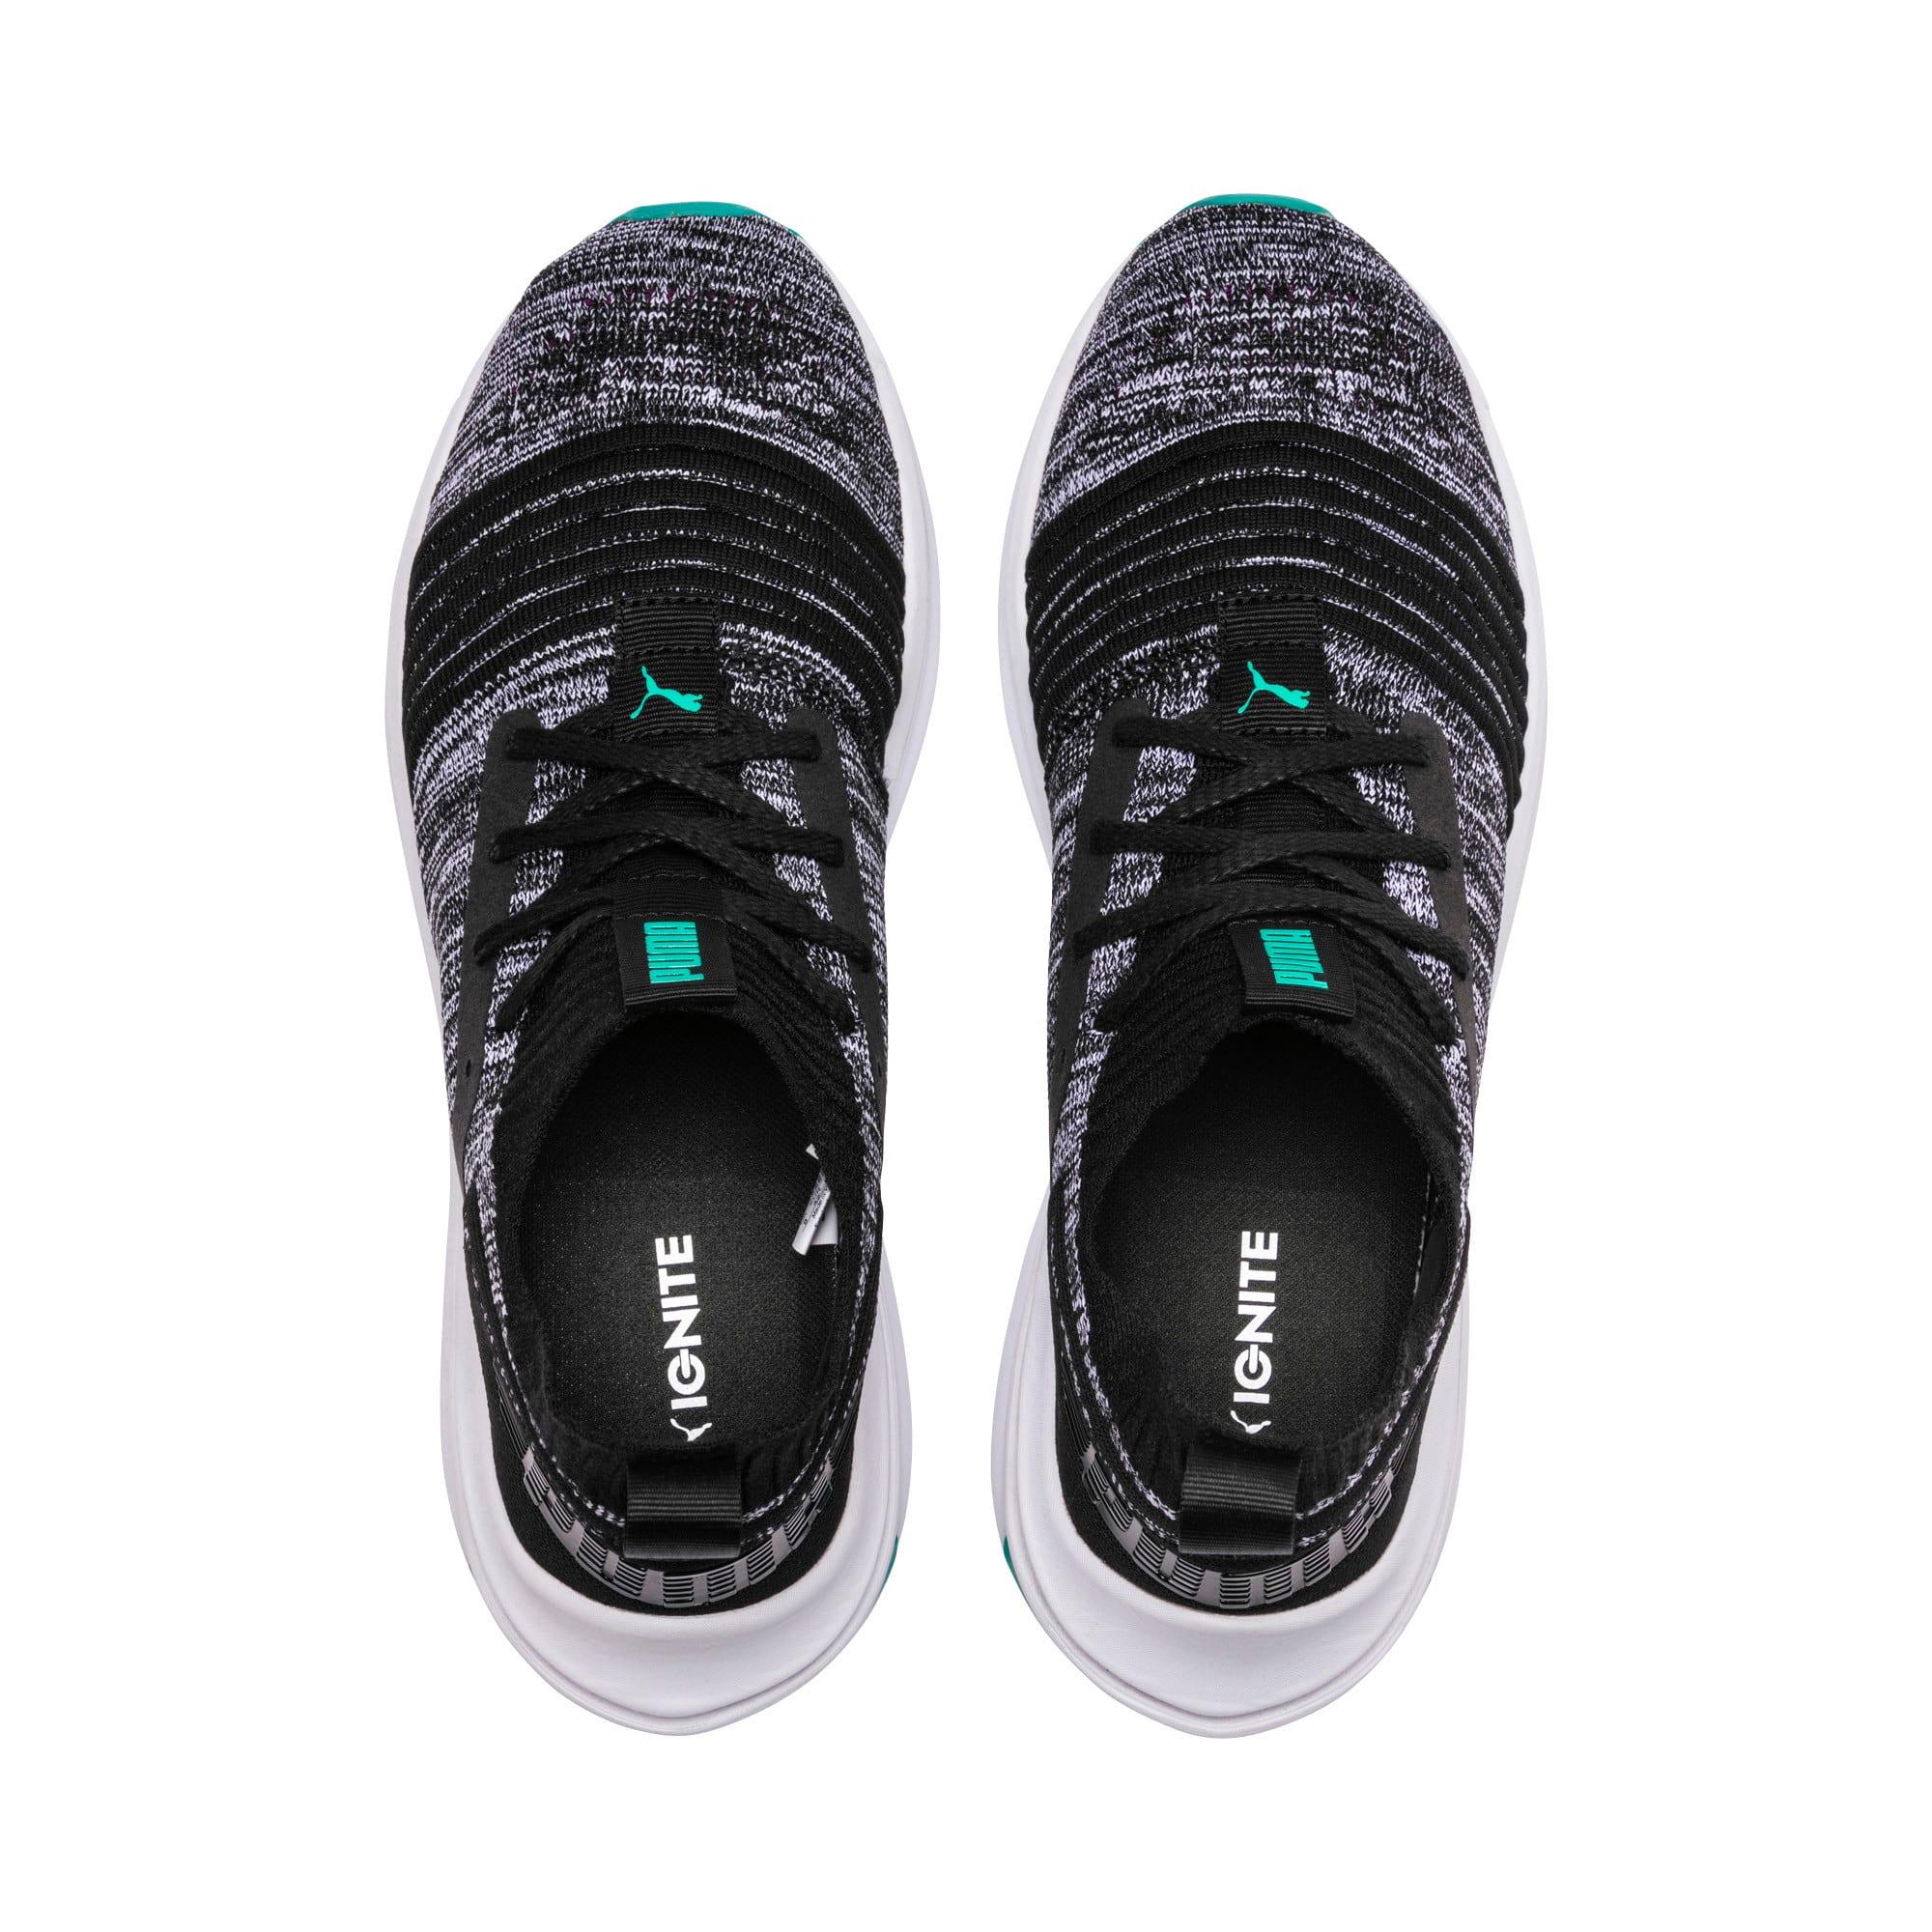 Thumbnail 6 of IGNITE Limitless SR evoKNIT Men's Sneakers, Puma Black-Spectra Green, medium